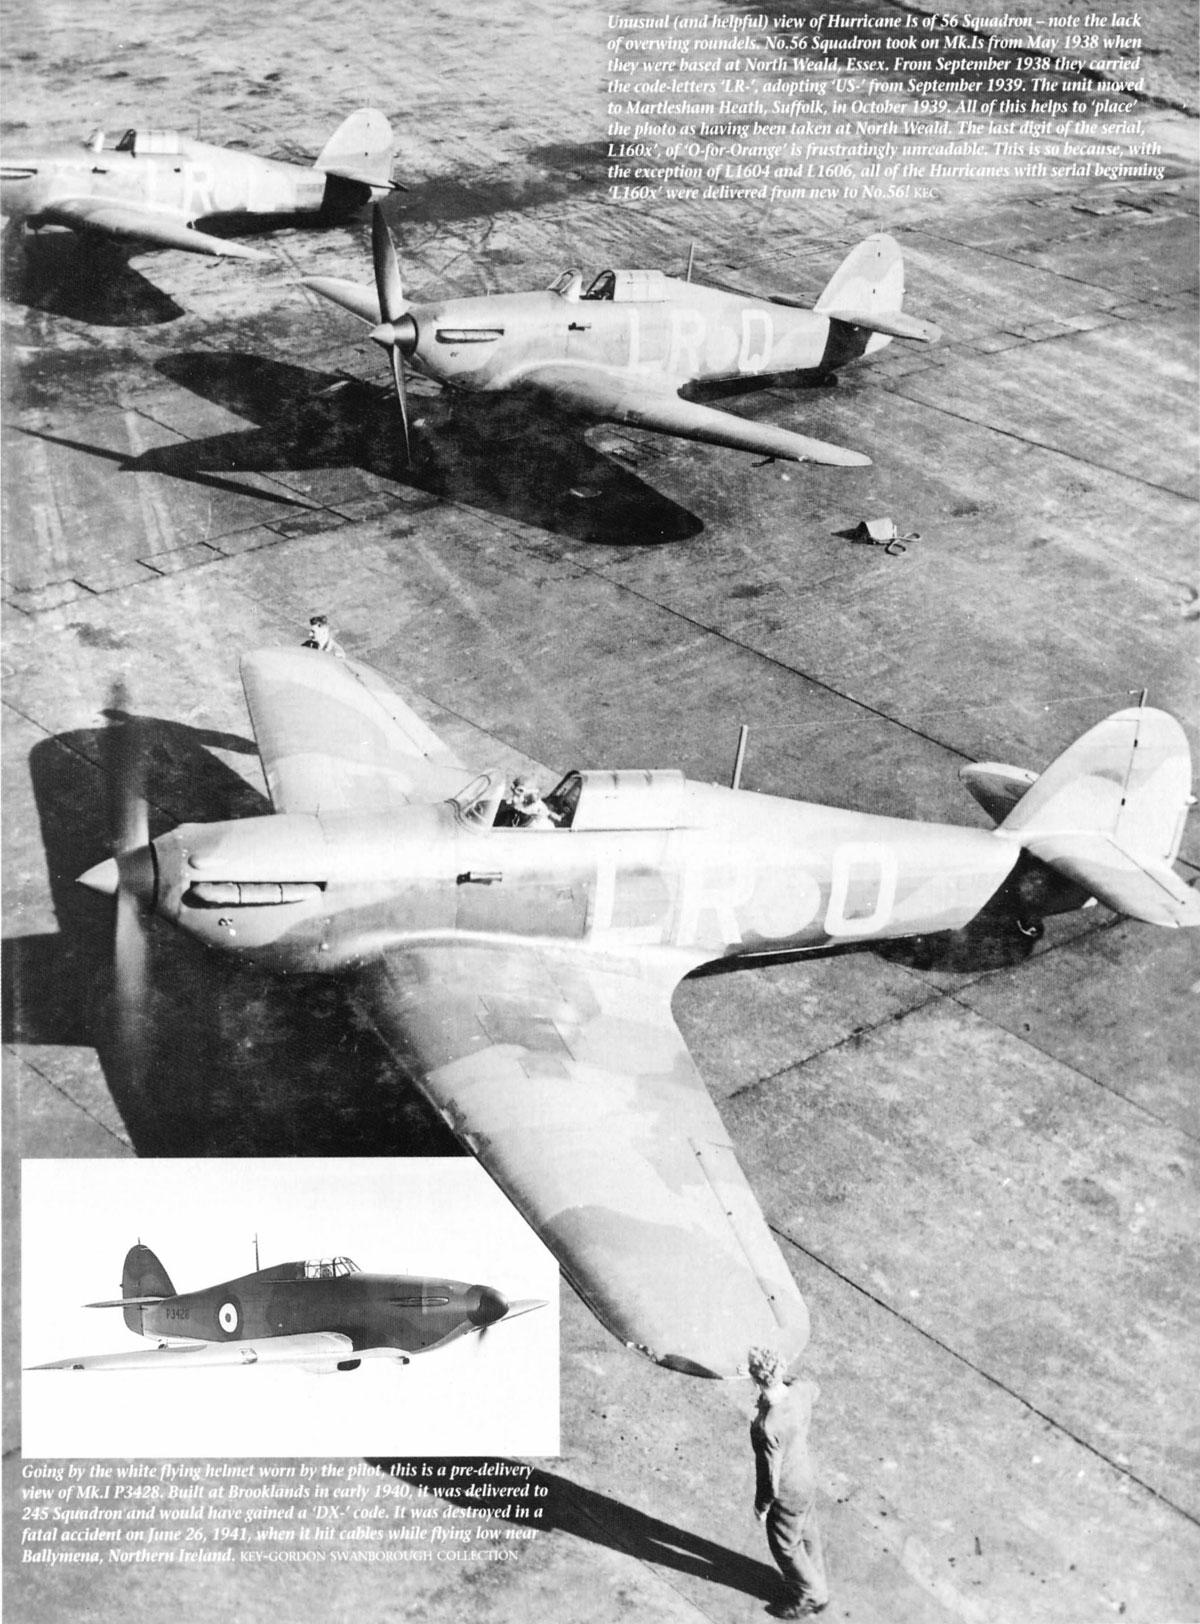 Hawker Hurricane I RAF 56Sqn LRO L160x North Weald Essex May 1938 01